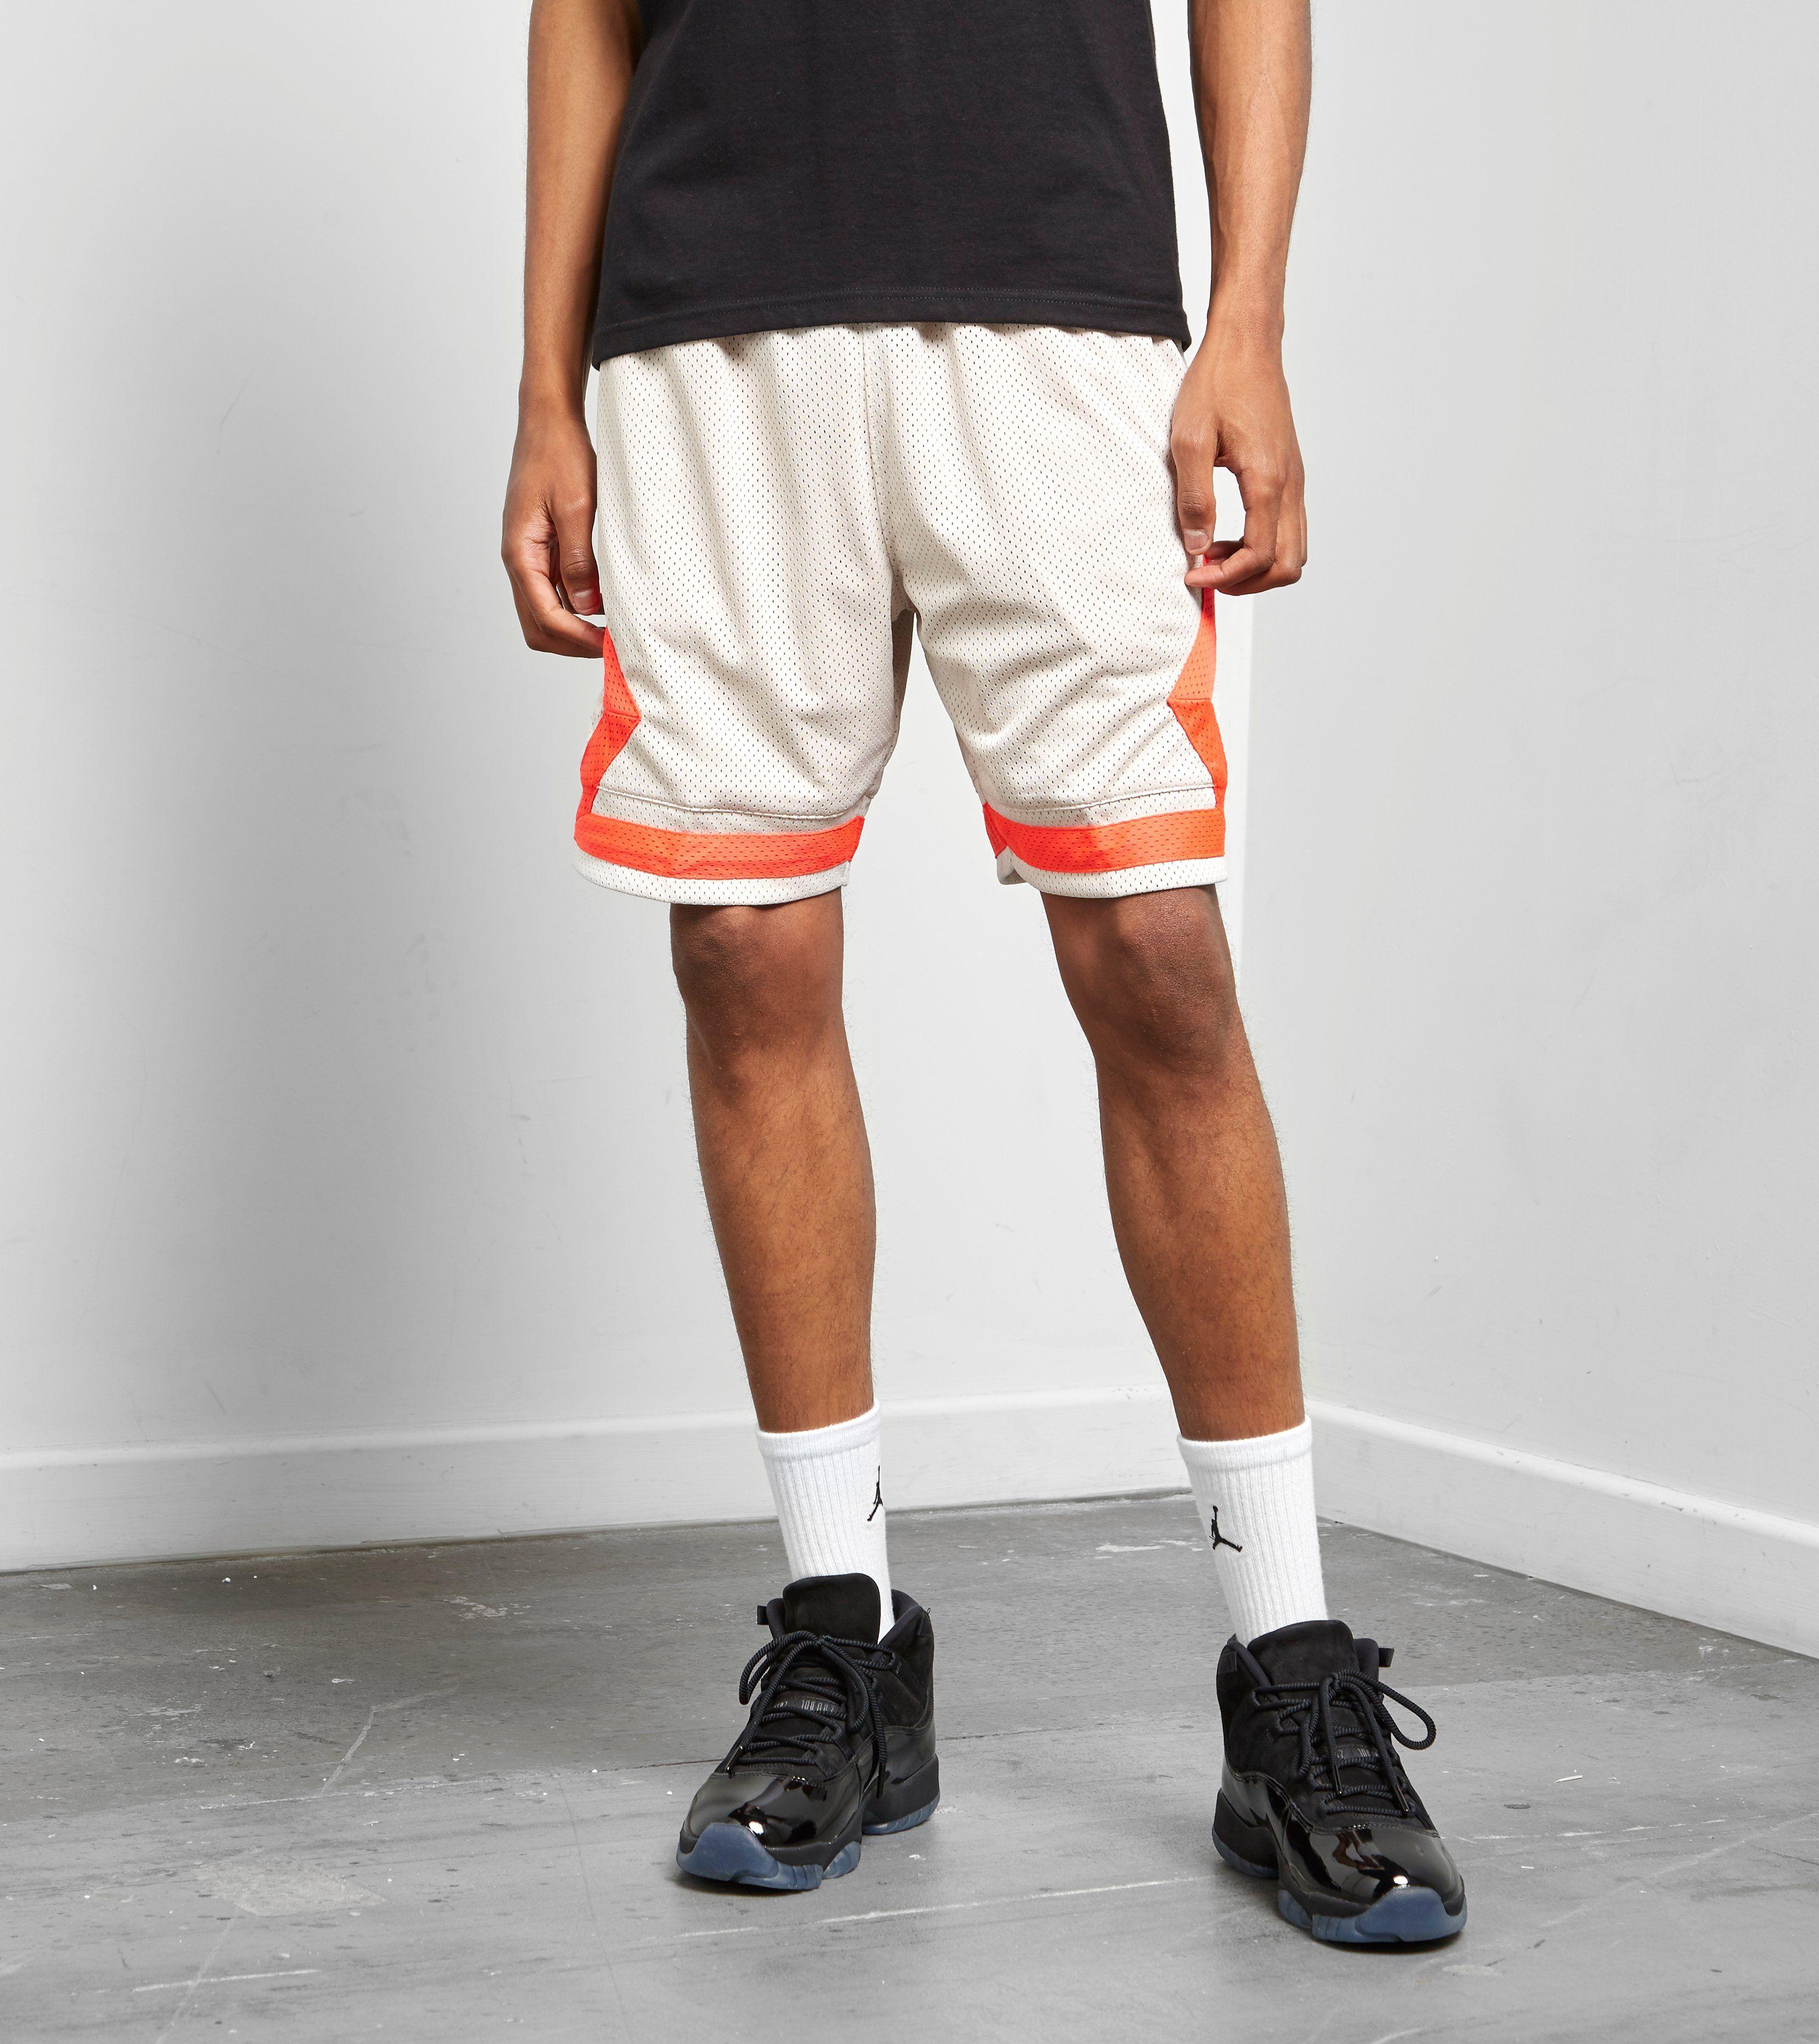 Jordan Lifestyle Diamond Shorts